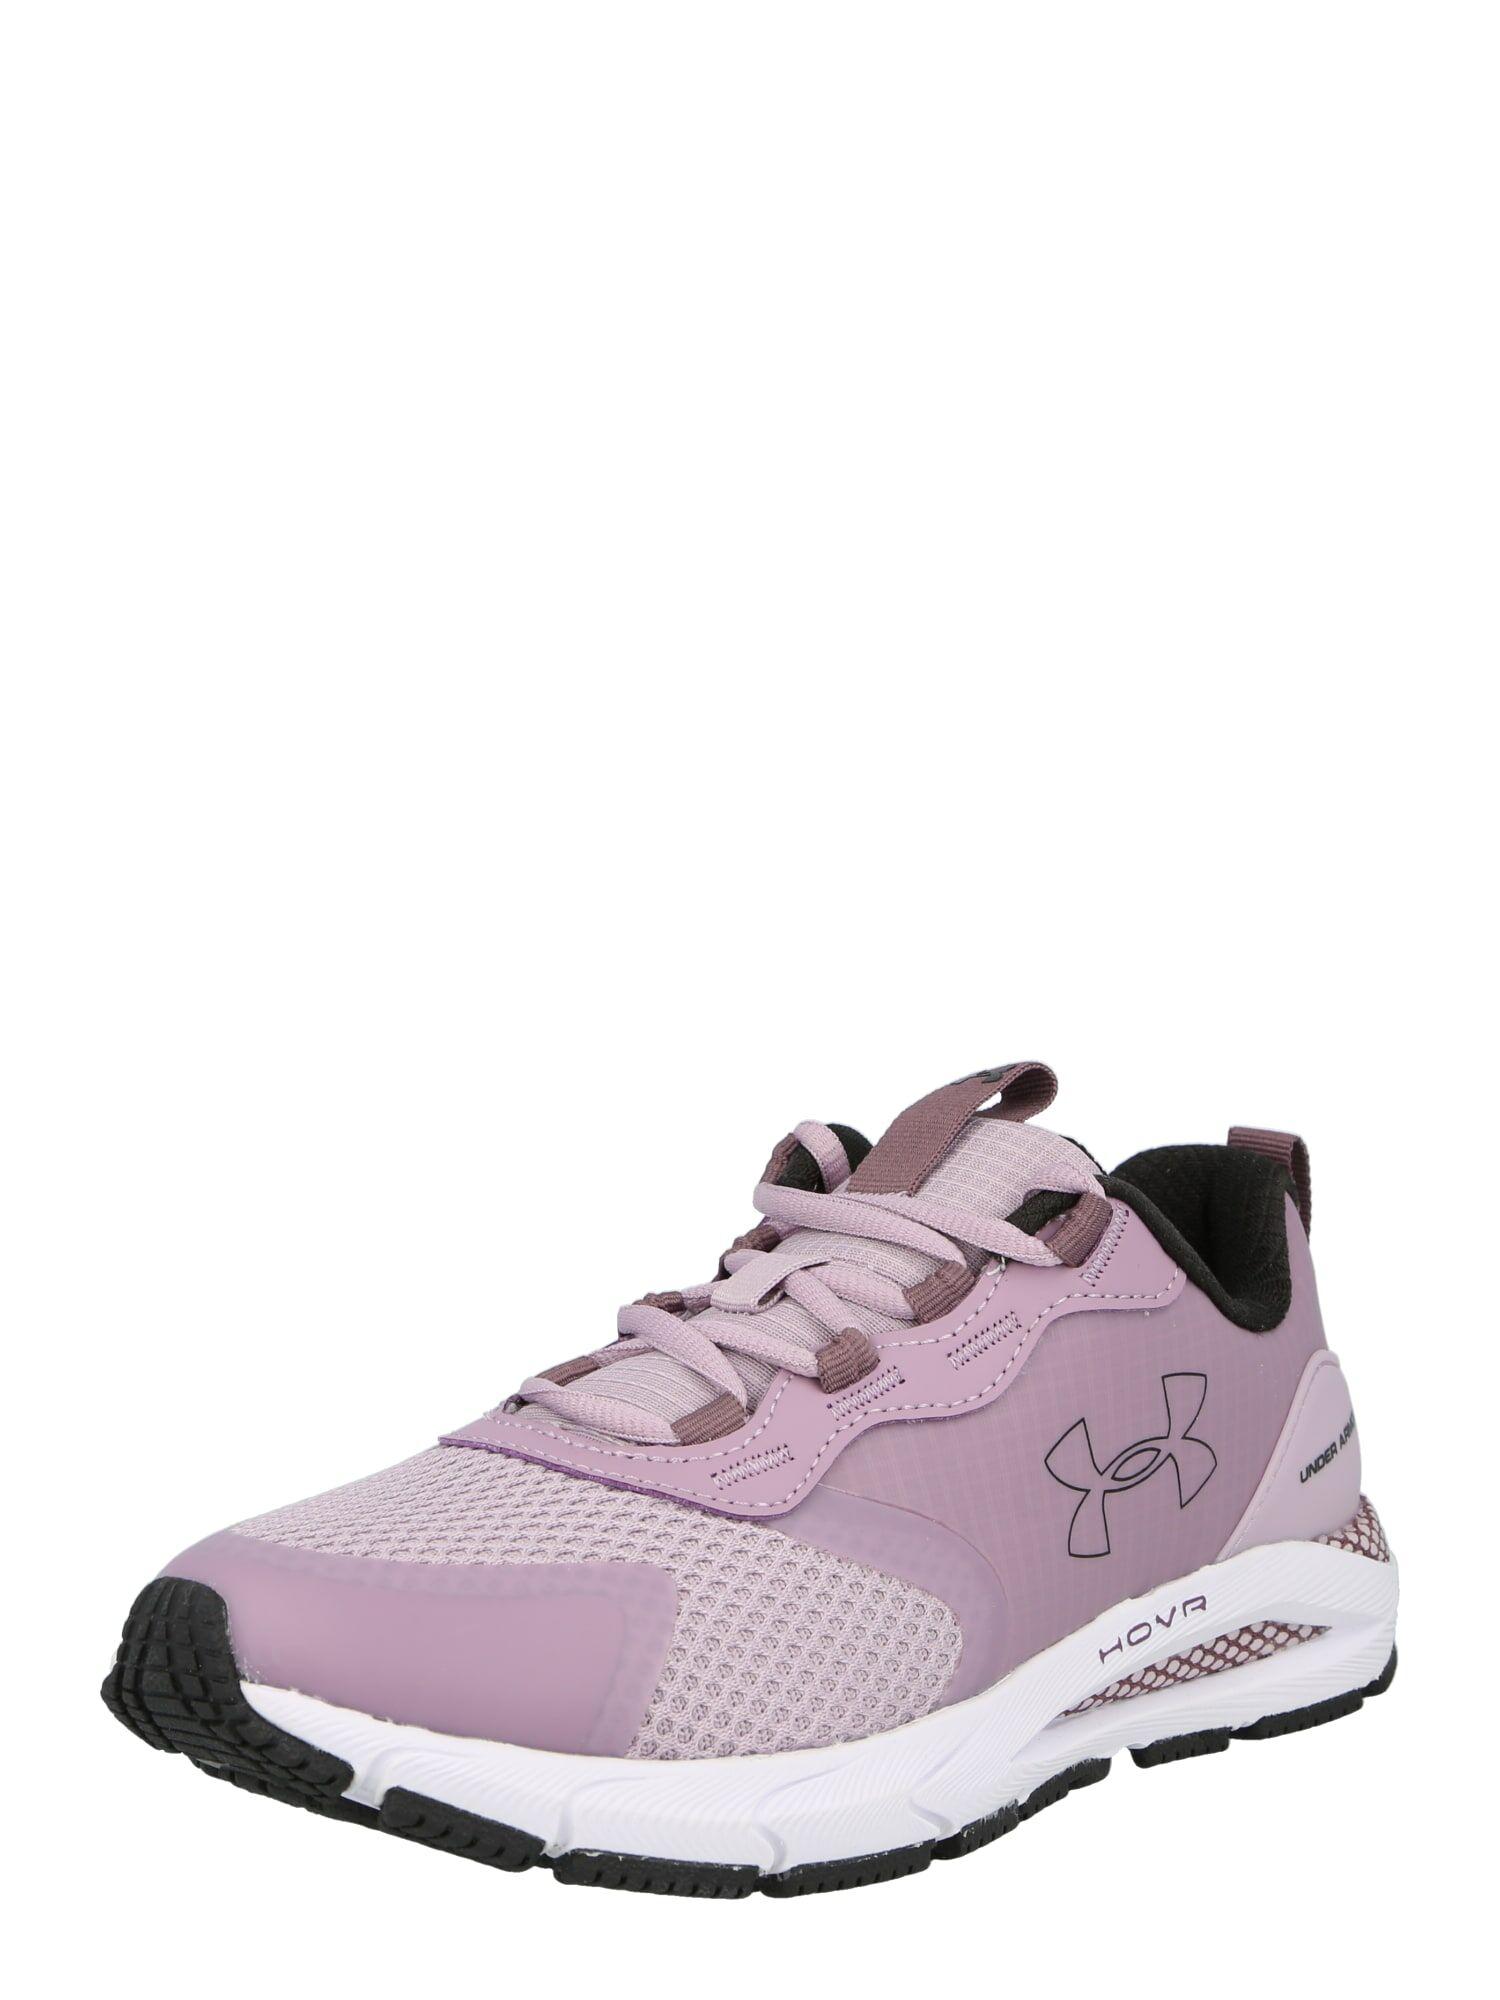 UNDER ARMOUR Chaussure de course 'Sonic'  - Violet - Taille: 8.5 - female